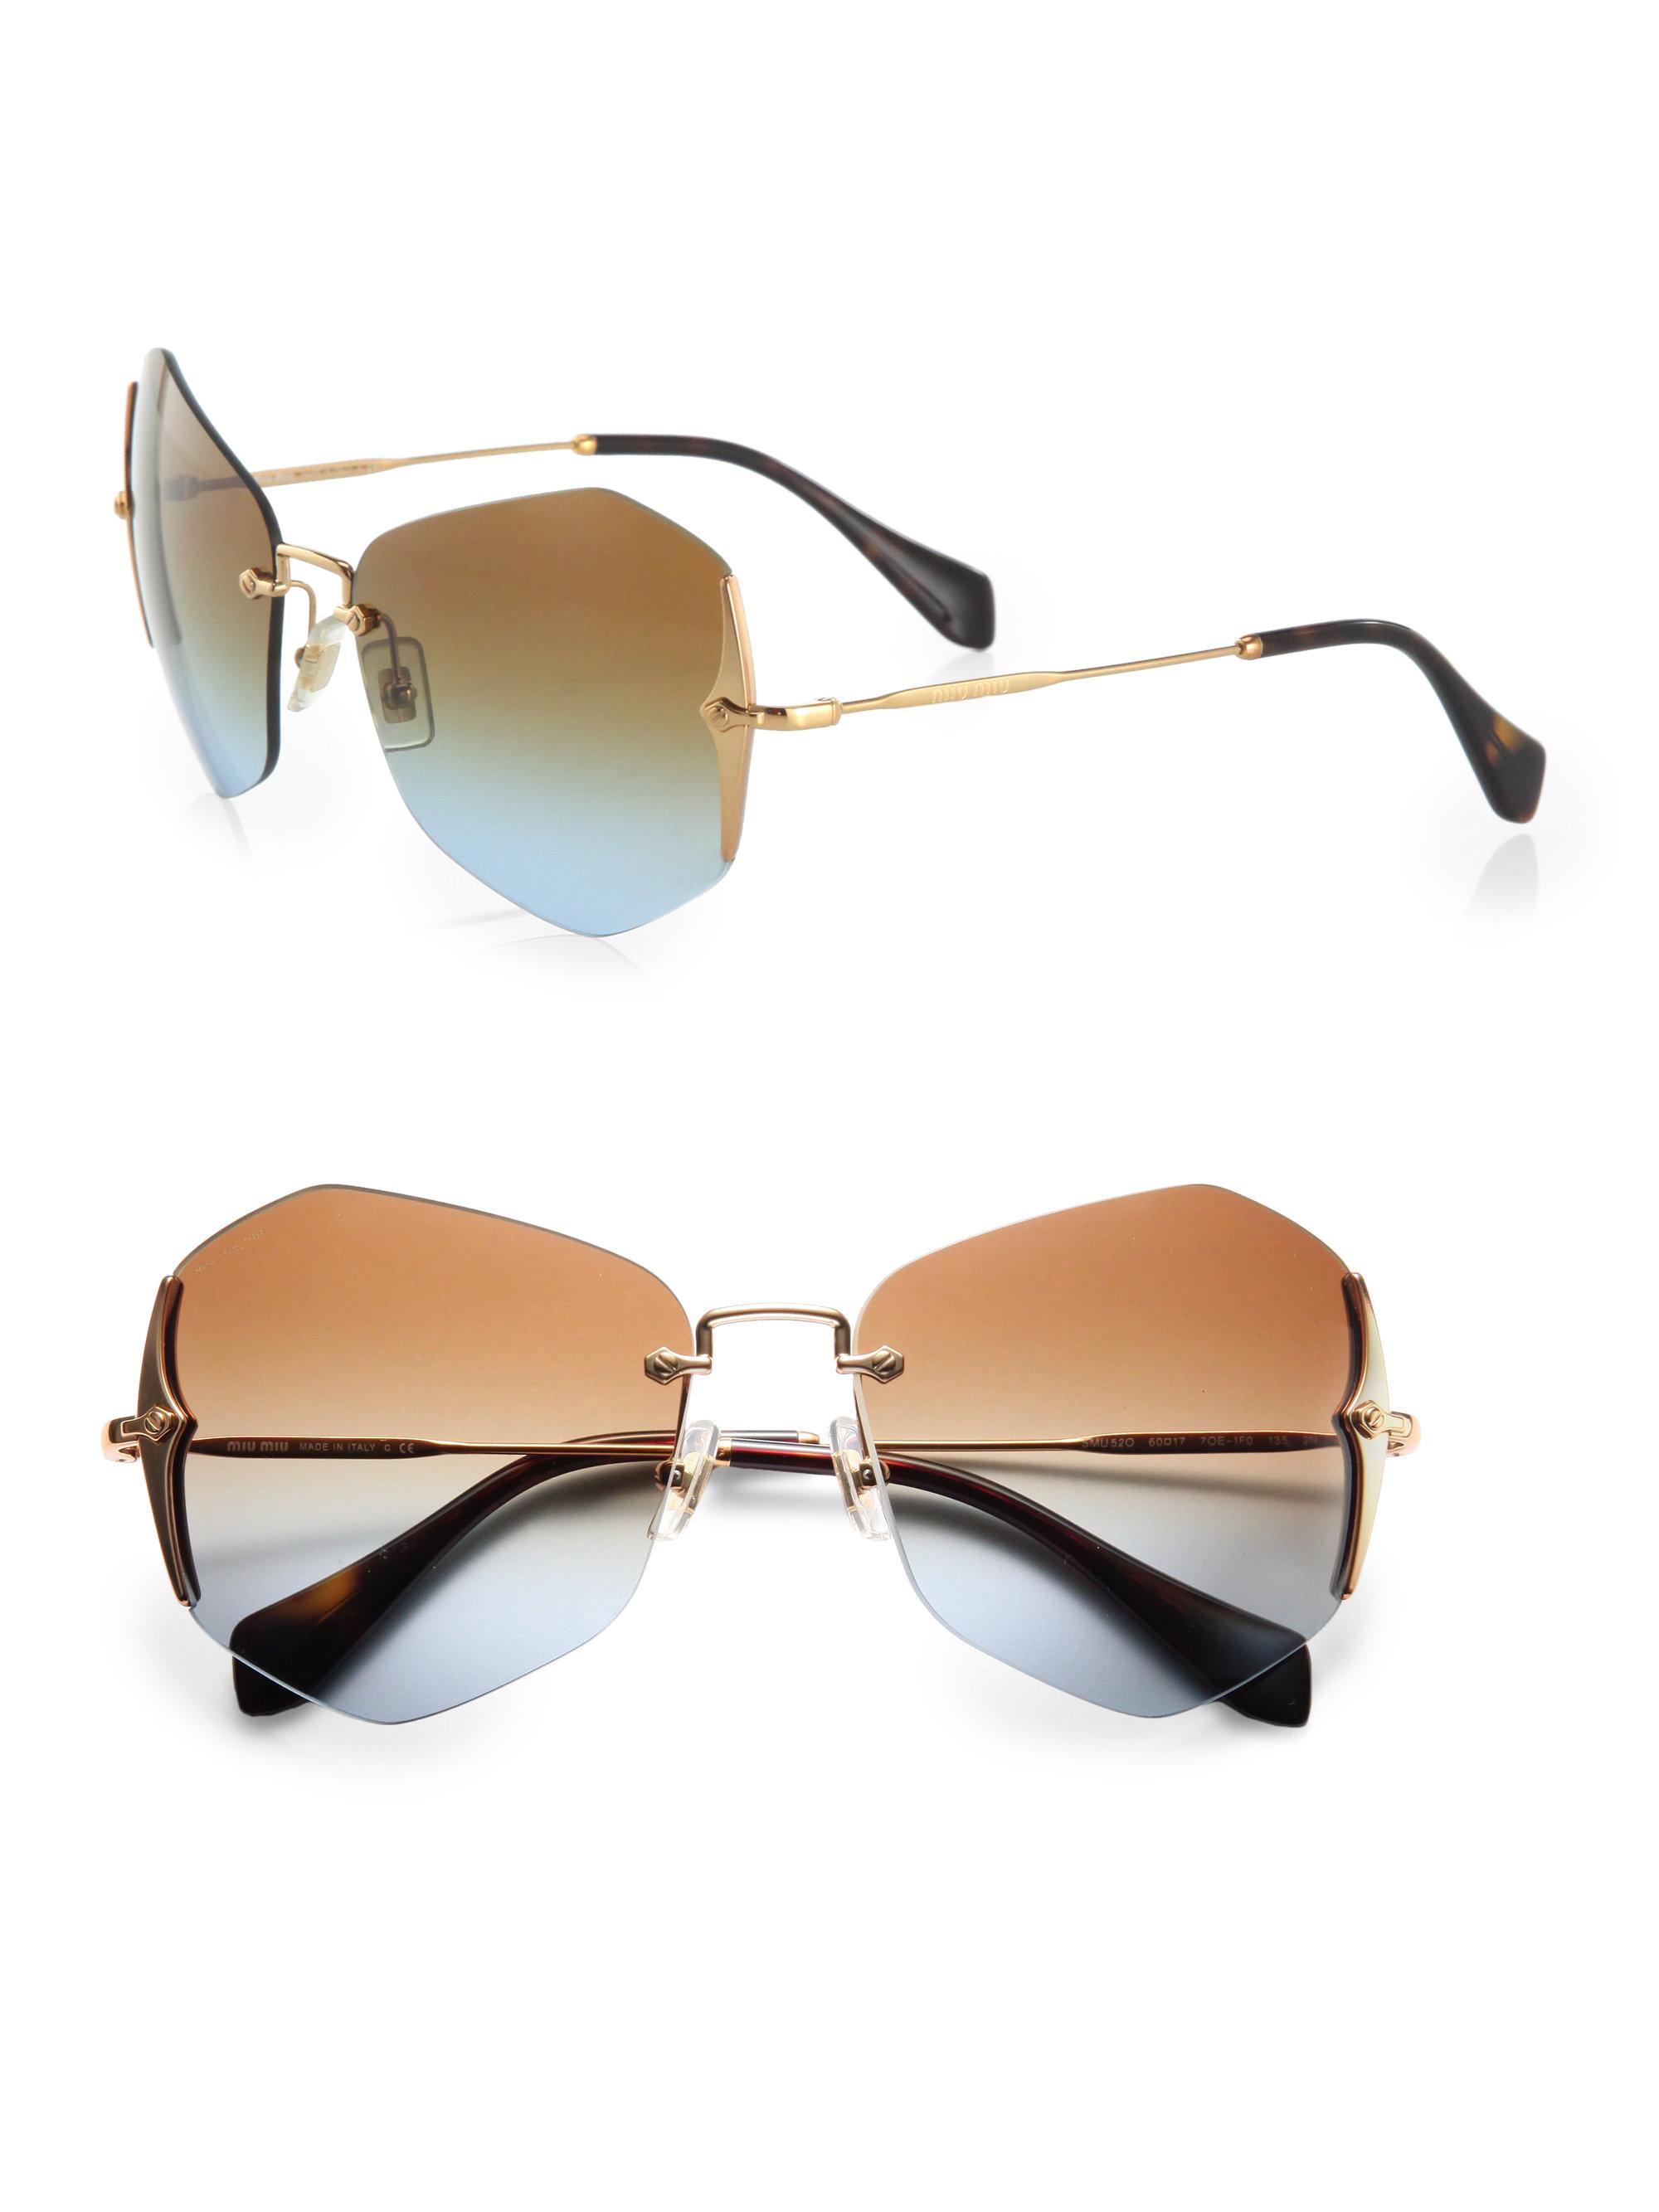 a8be62bde27 Miu Miu Sunglasses For Women